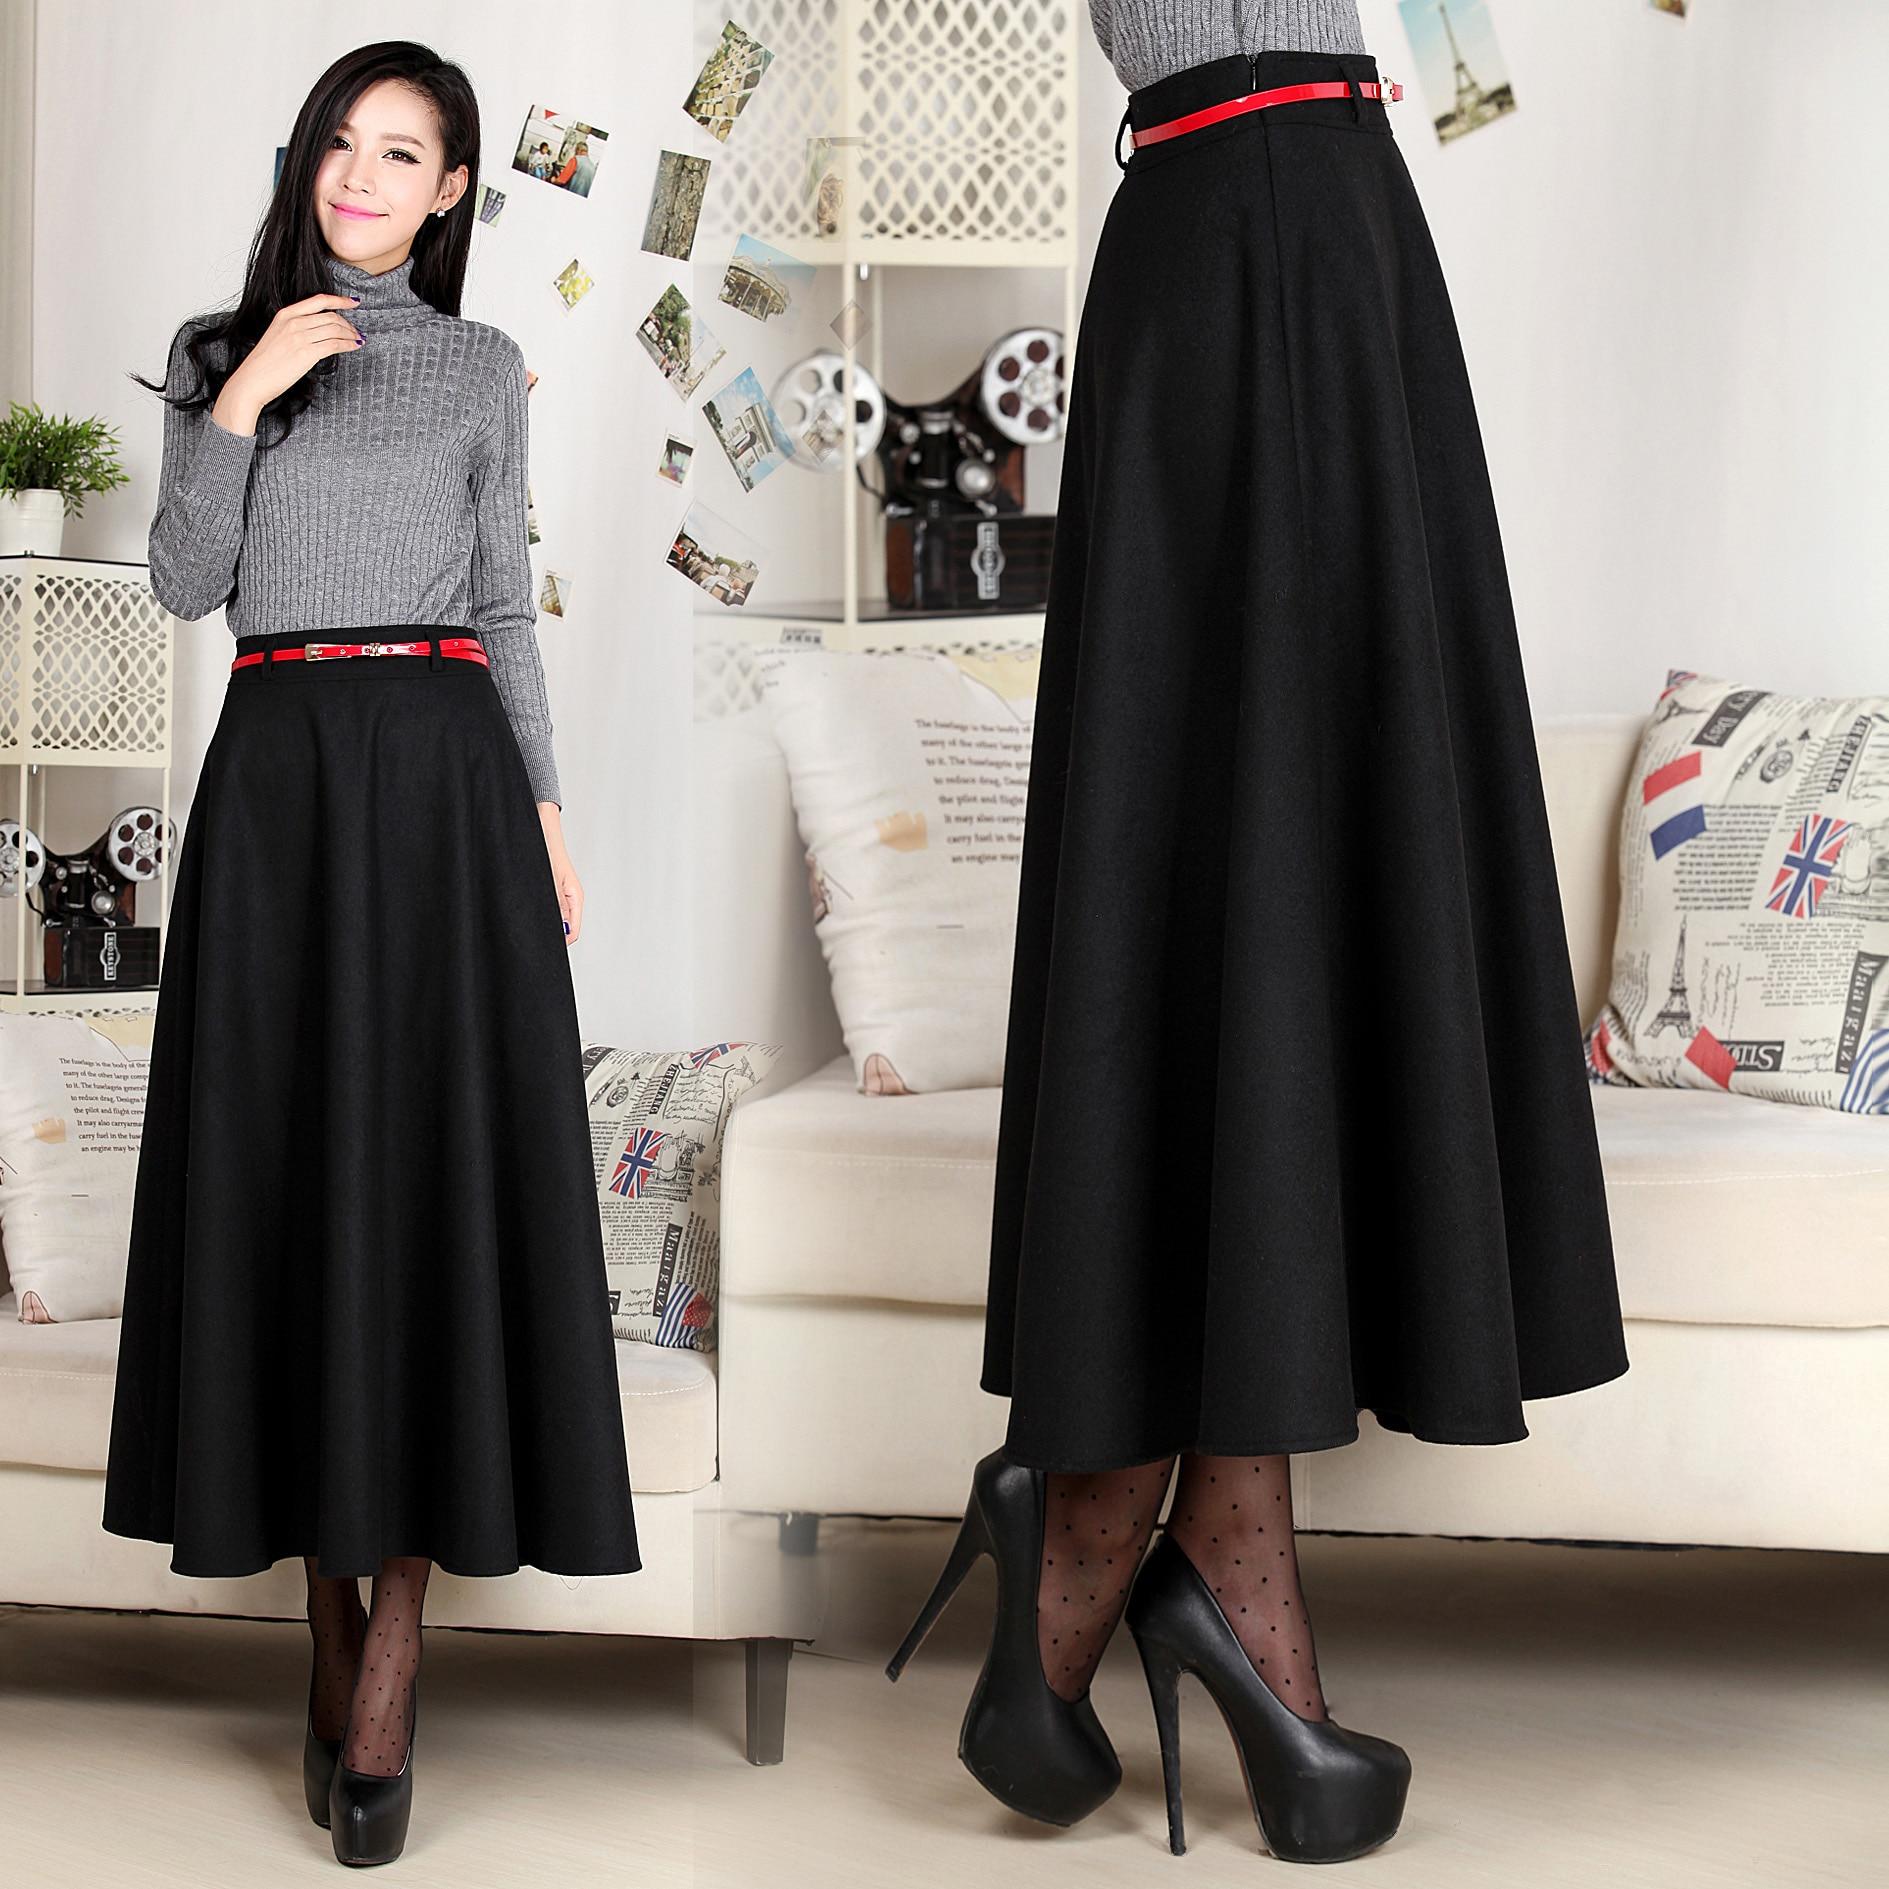 Black A Line Denim Skirt 2017 | Dress Ala - Part 480